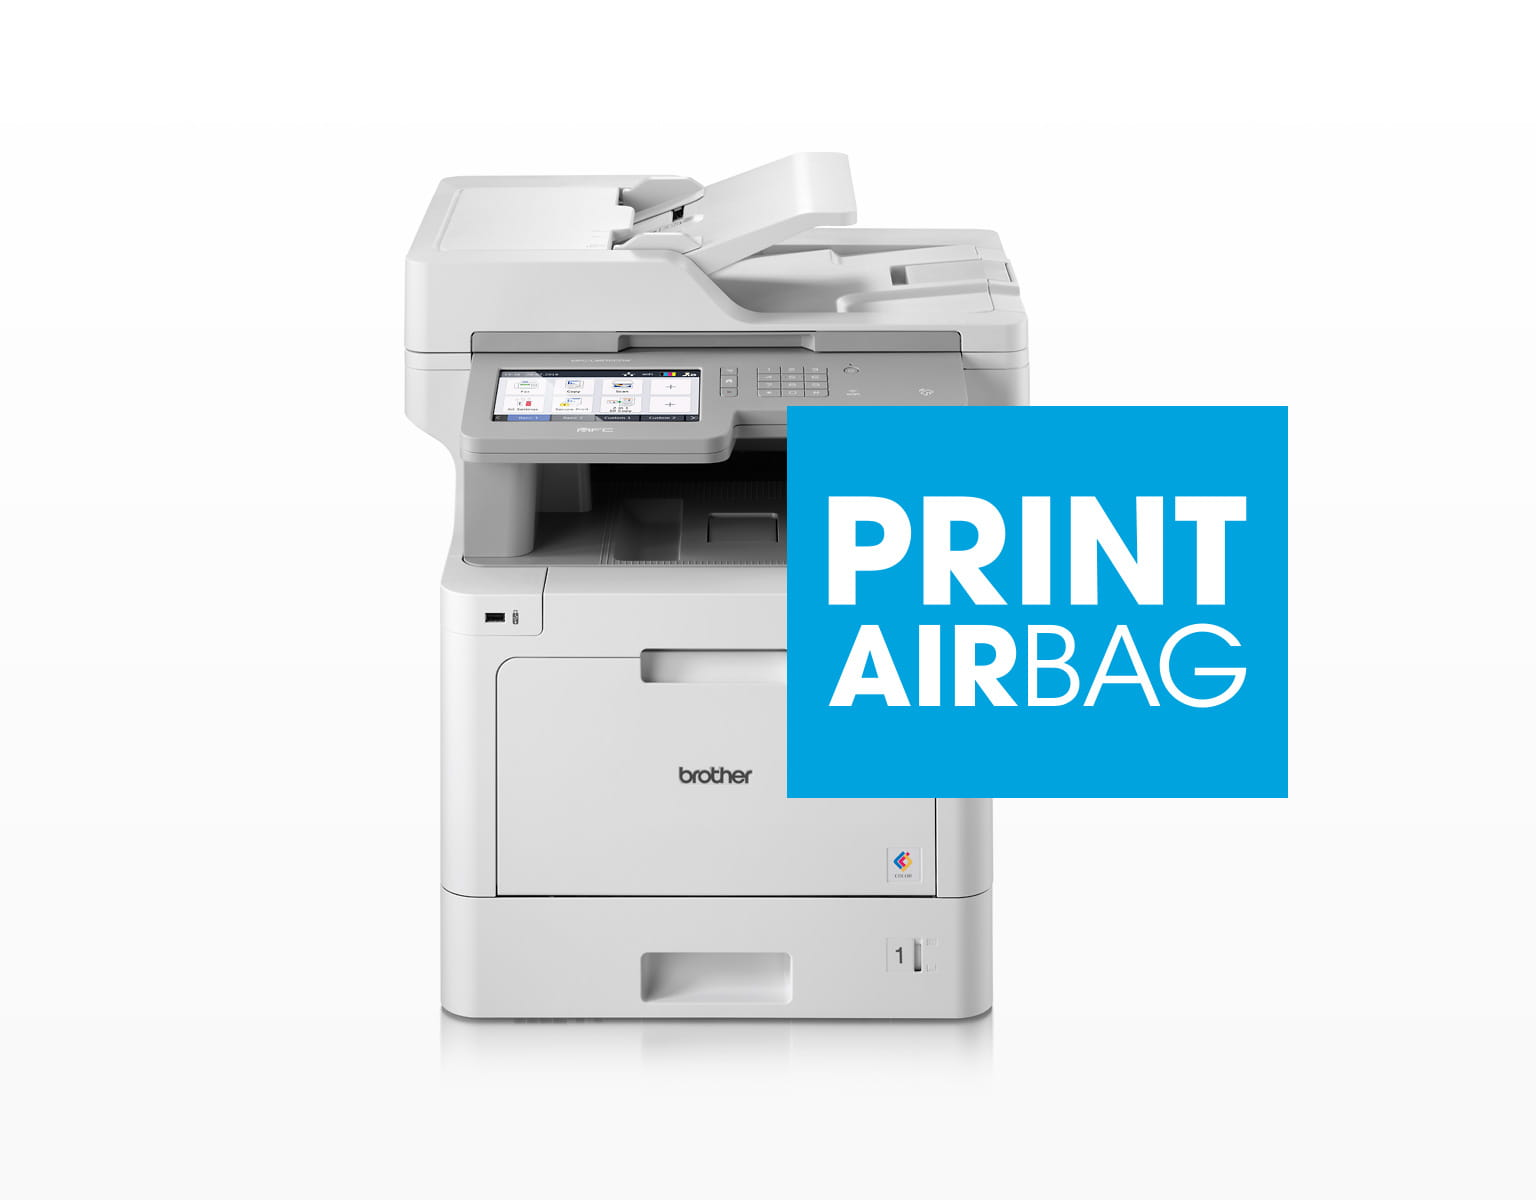 Brother Multifunktionsdrucker mit PRINT AirBag Logo